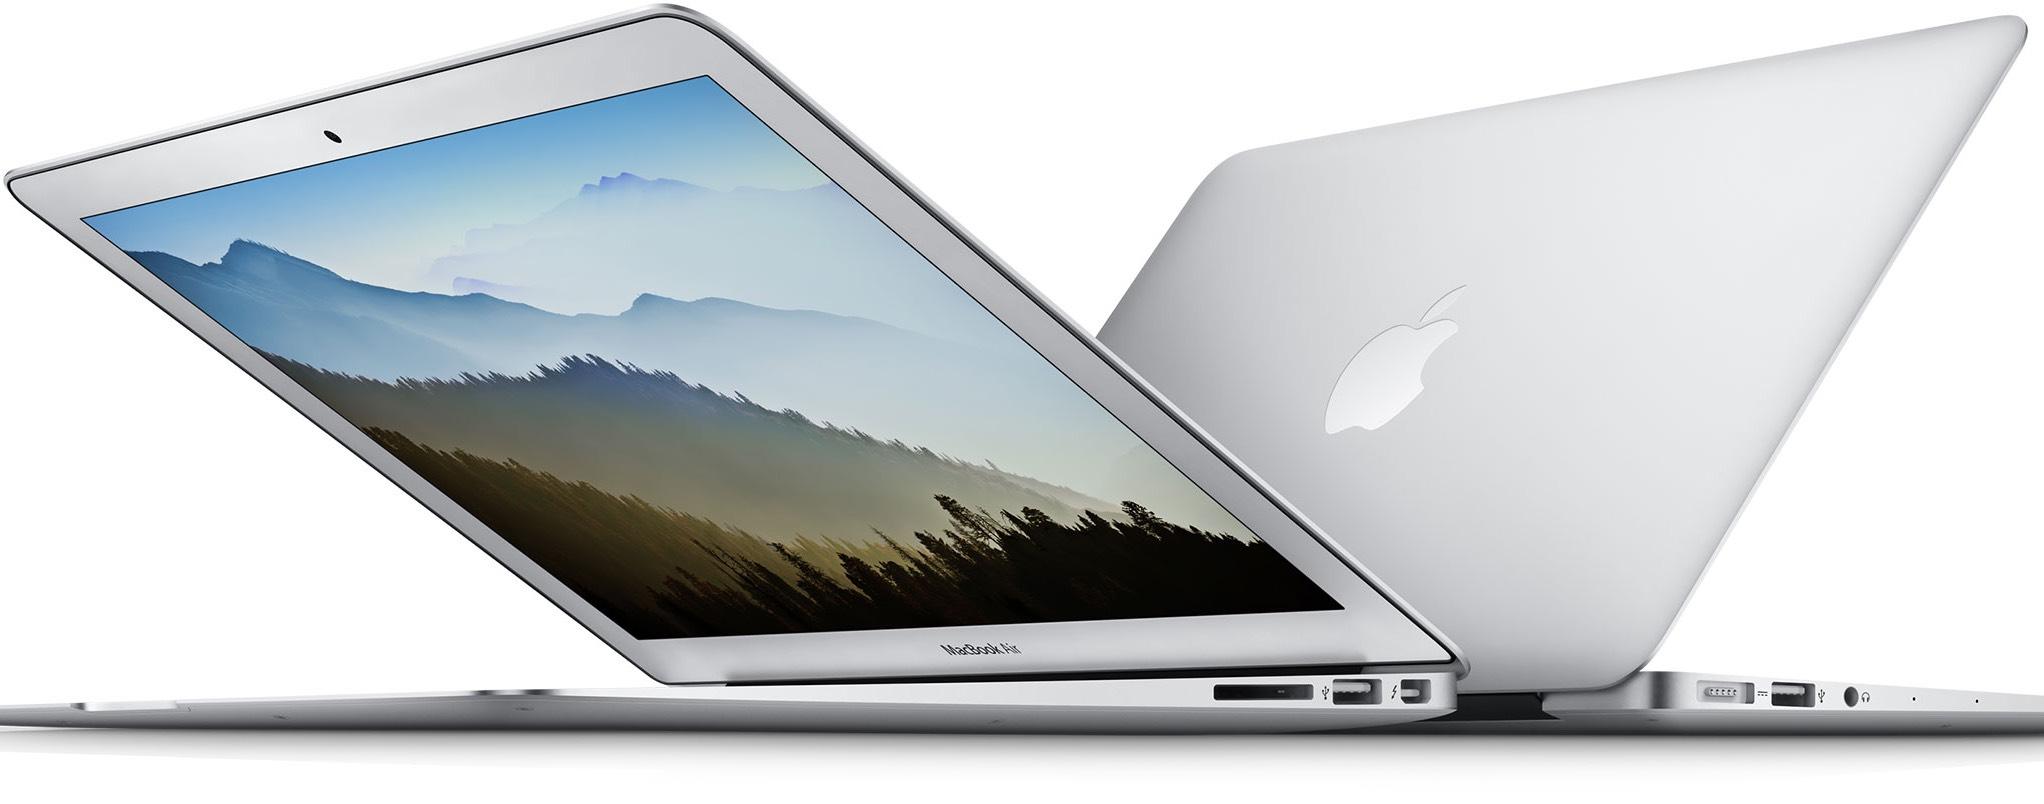 how to create a folder on a macbook air